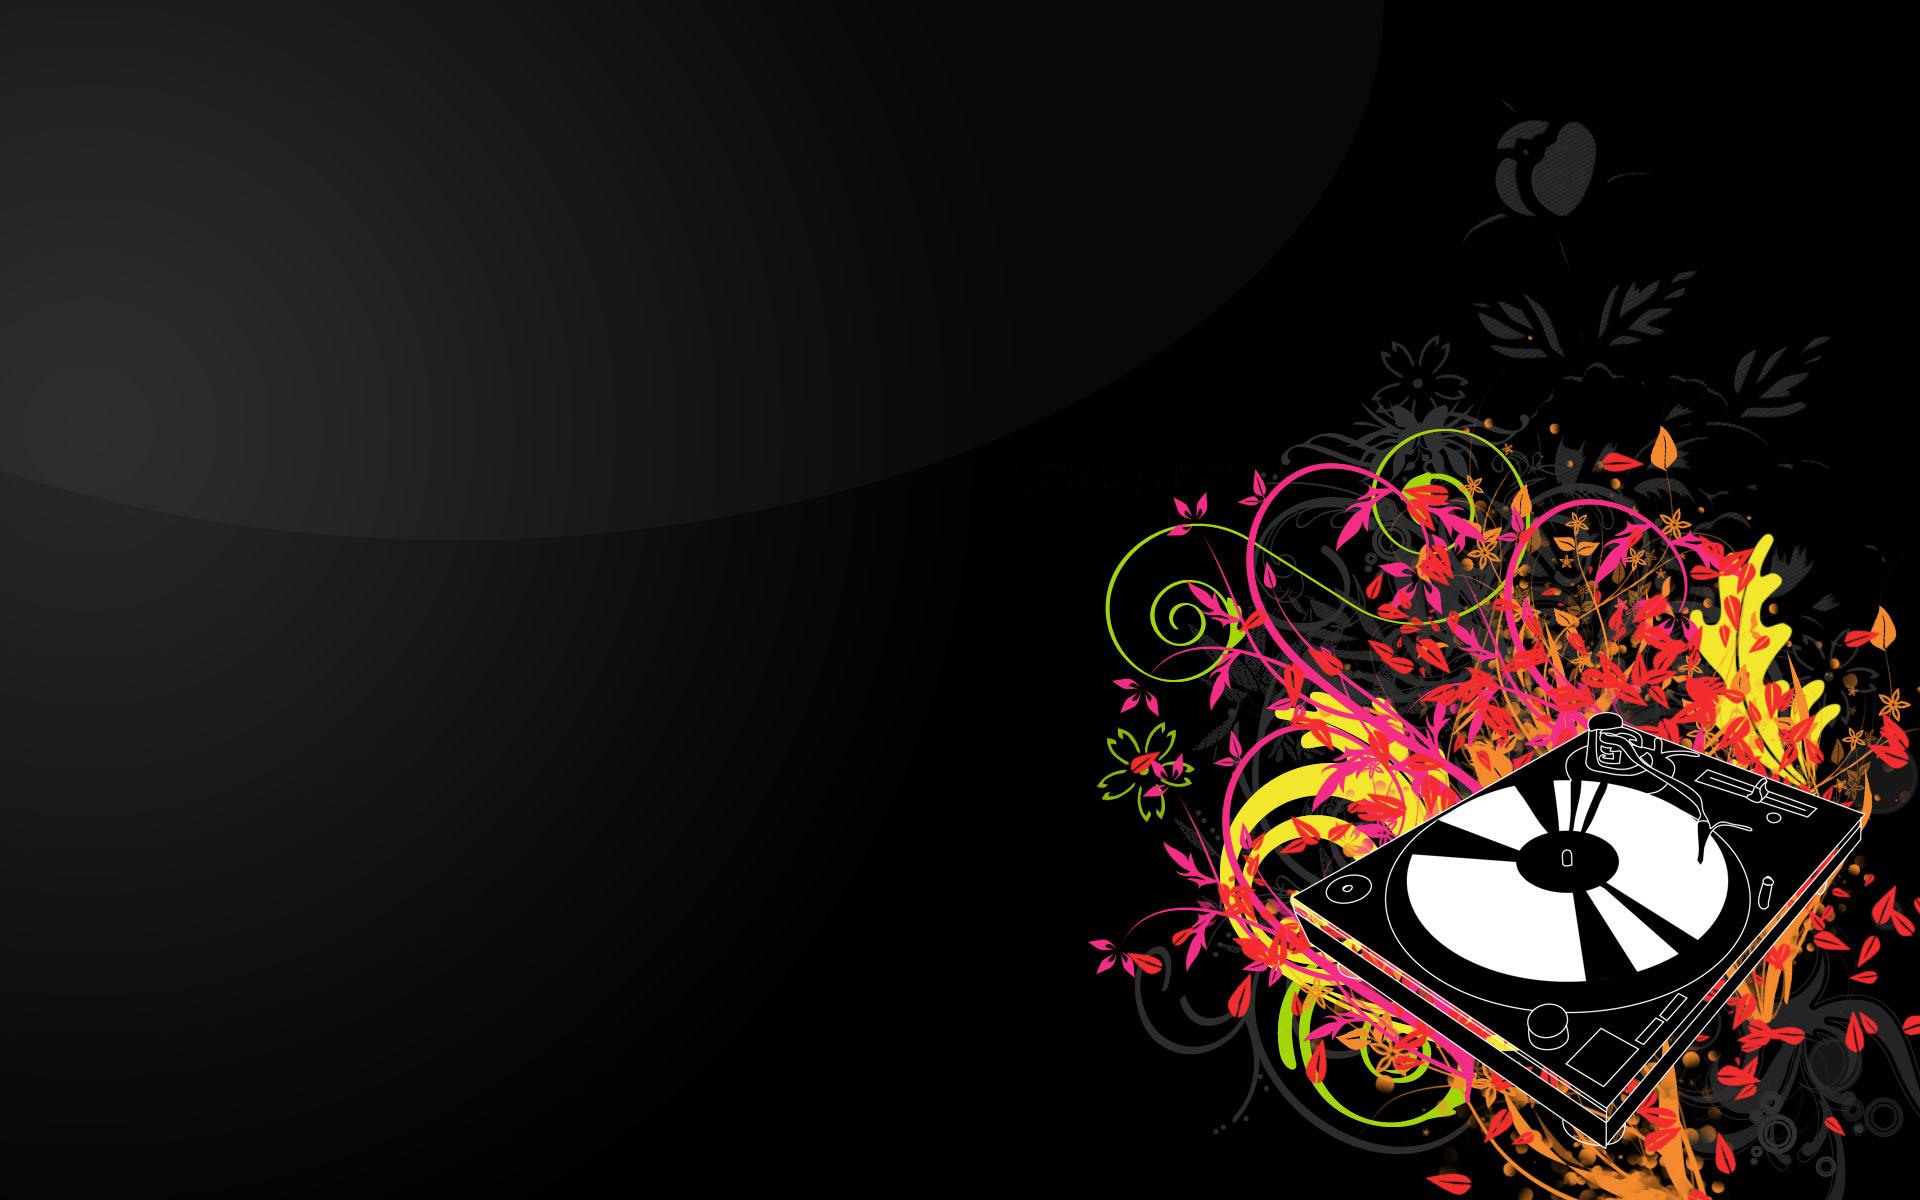 dj wallpaper music desktop background 1024x768 pictures